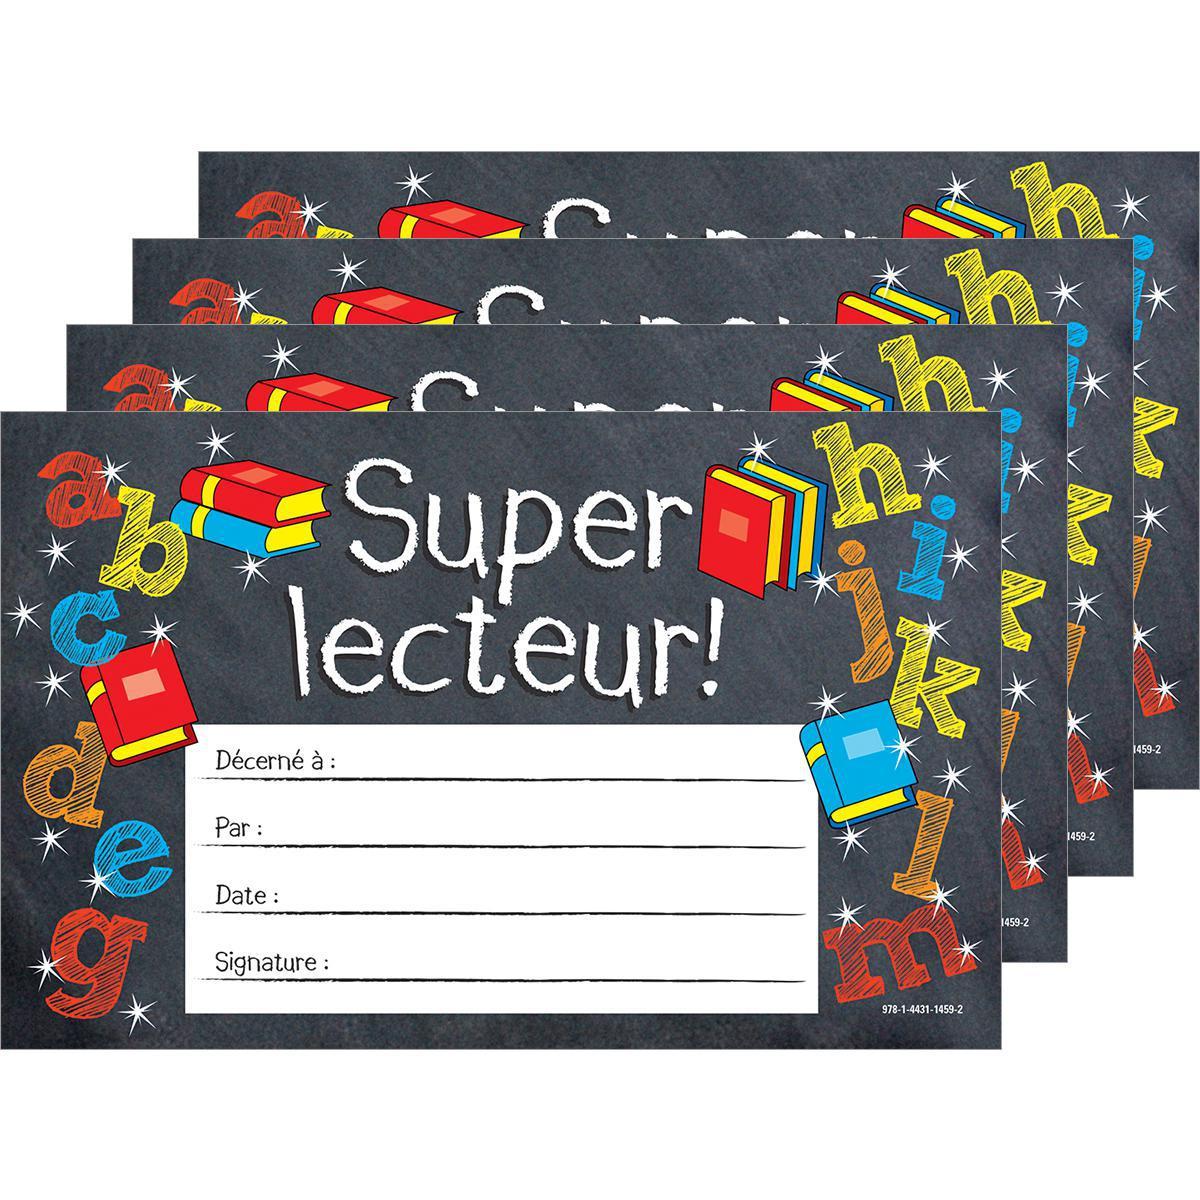 Certificats Super lecteur!